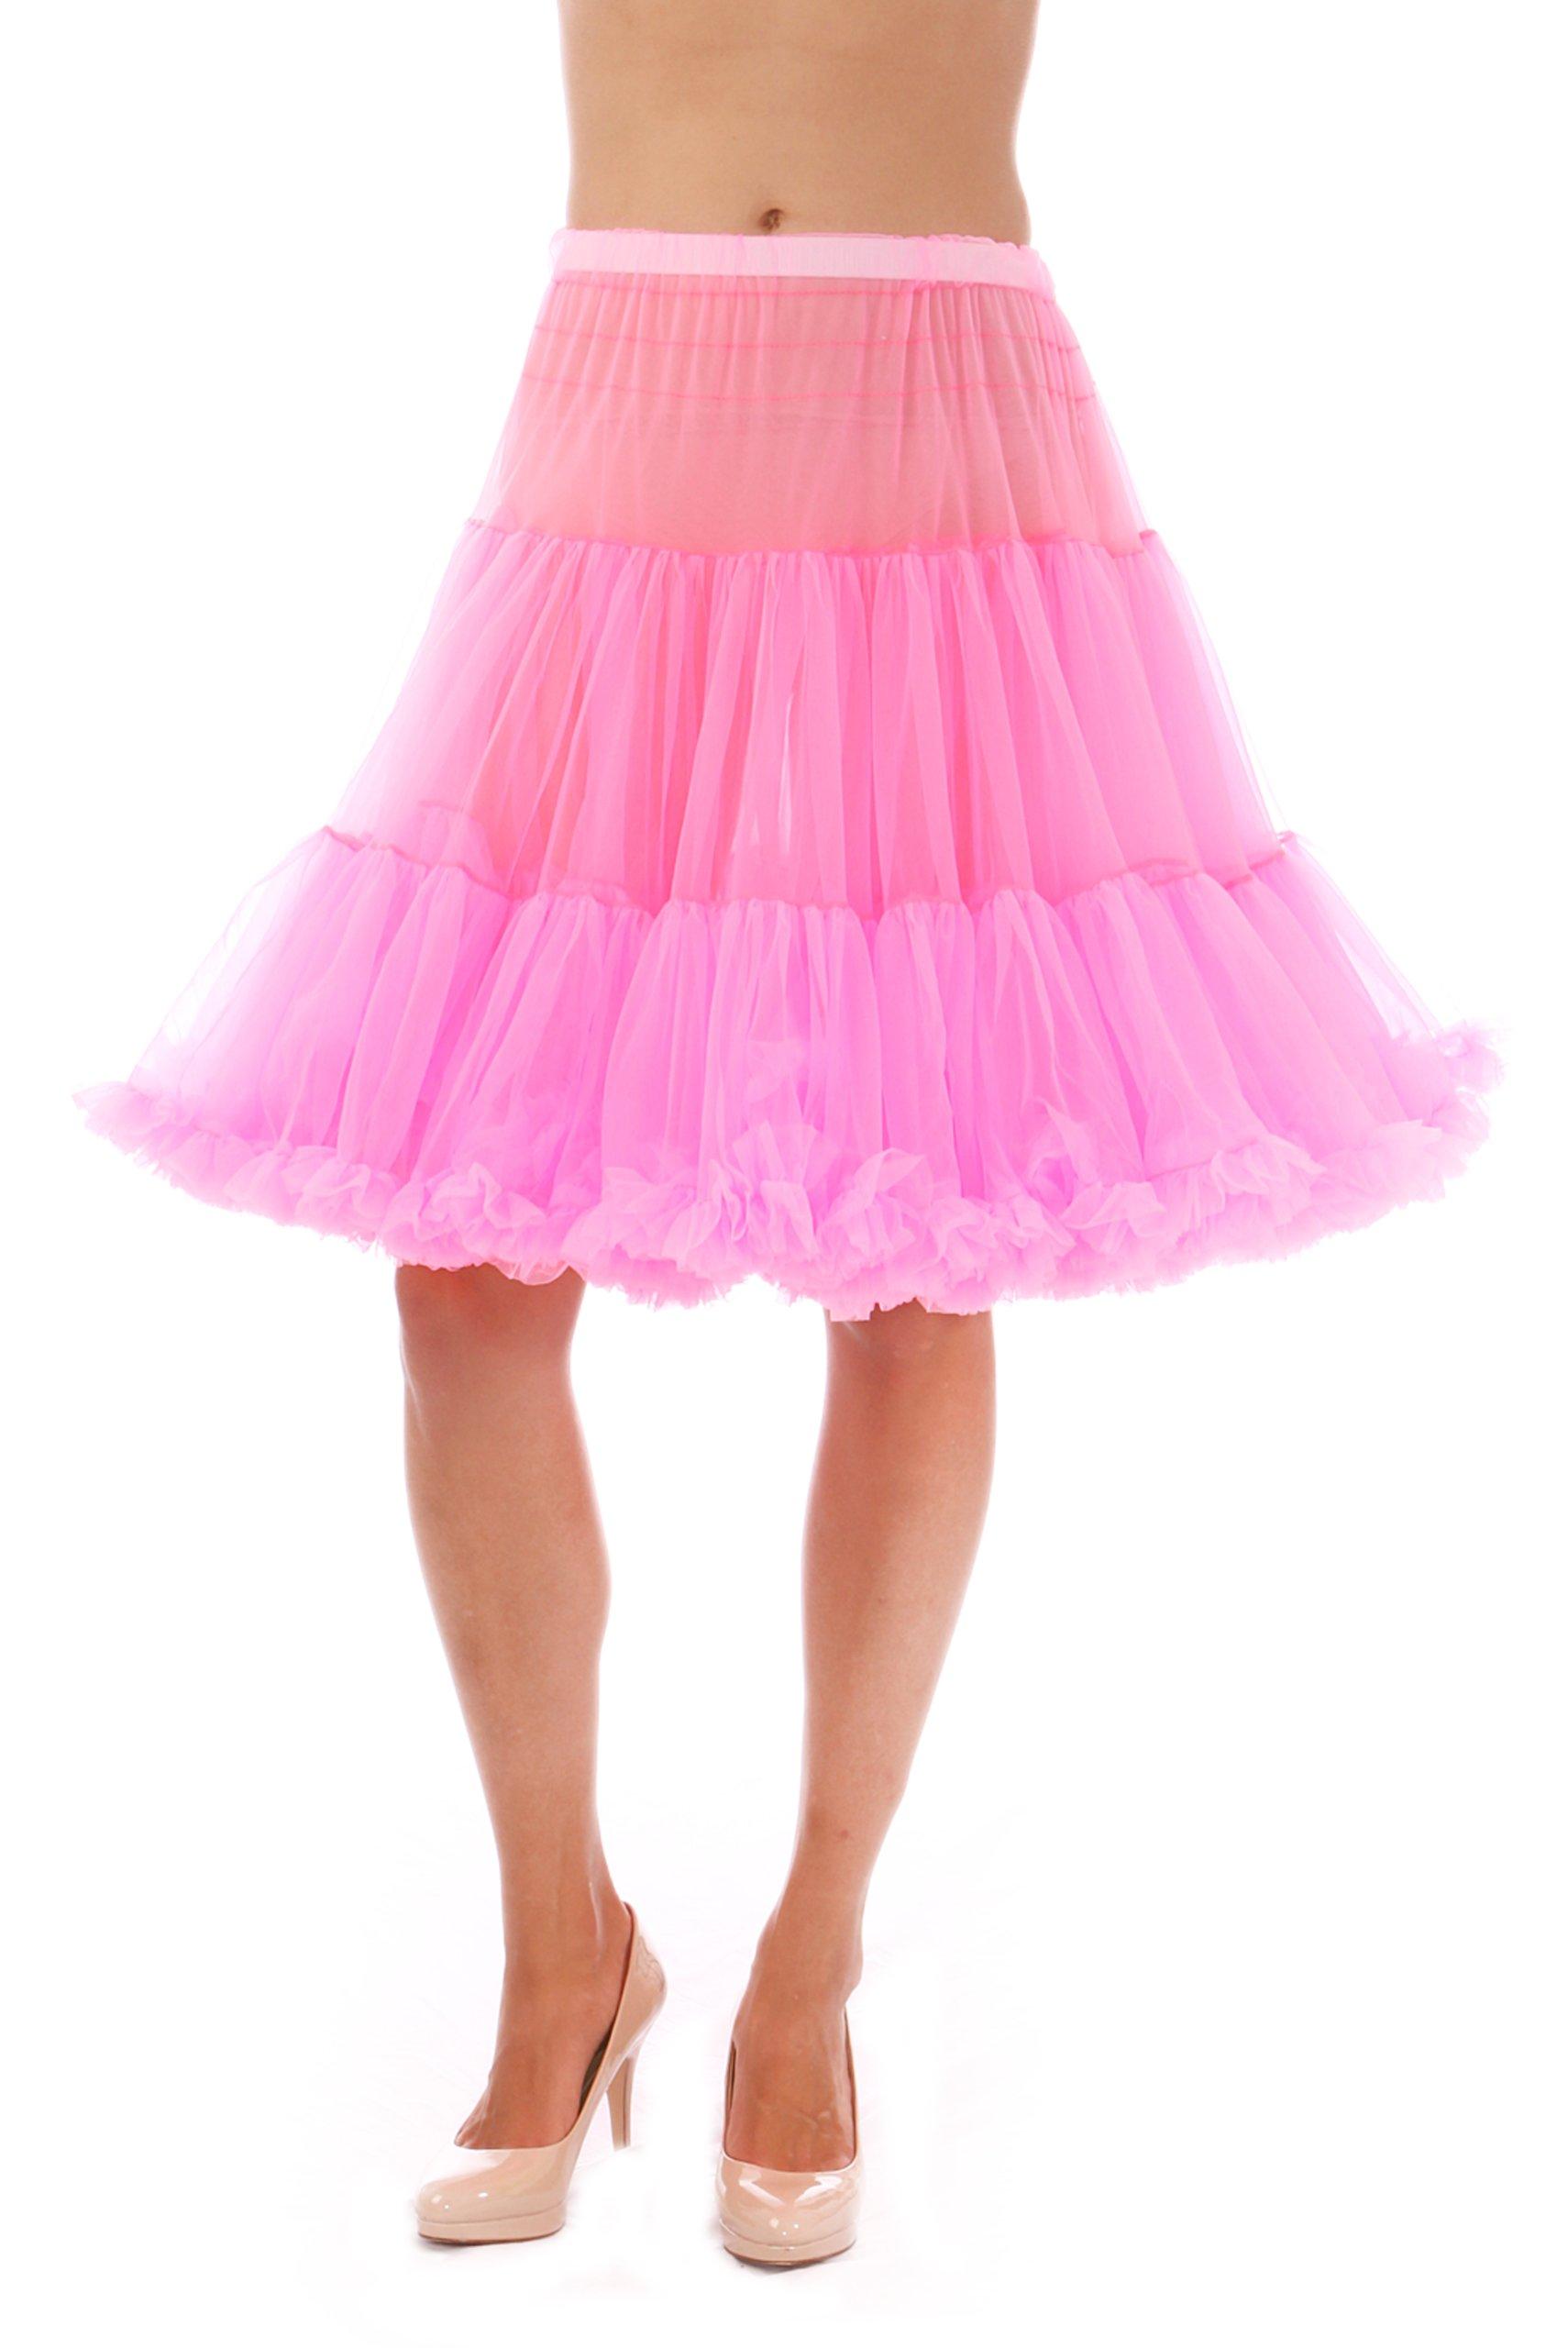 Malco Modes Luxury Vintage Knee-Length Crinoline Jennifer Petticoat Skirt Pettiskirt, Adult Tutu for Rockabilly 50s, Hot Pink, Medium by Malco Modes